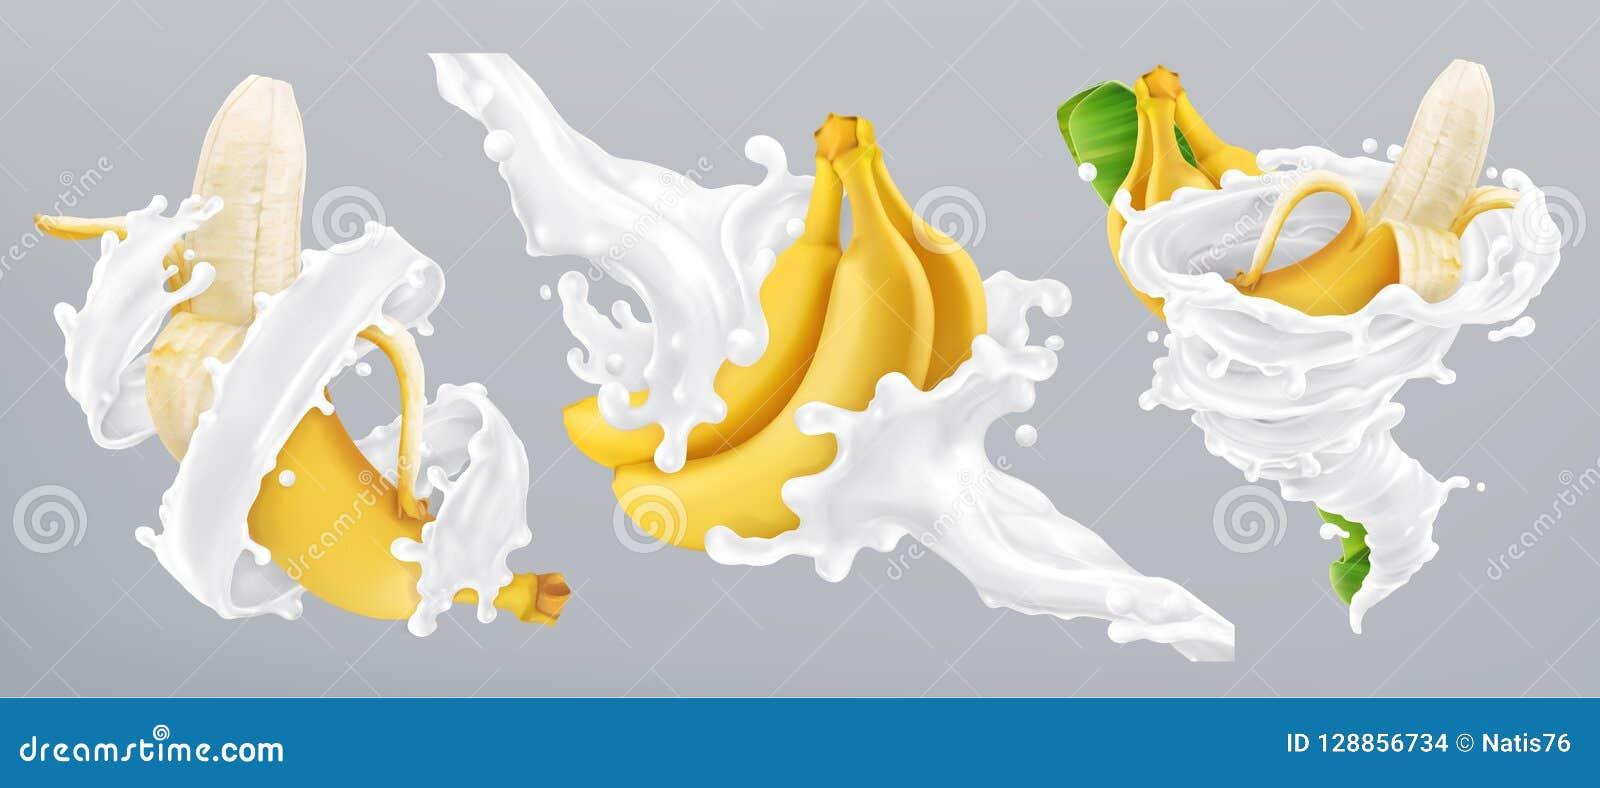 Banana Milk Stock Illustrations 5 781 Banana Milk Stock Illustrations Vectors Clipart Dreamstime